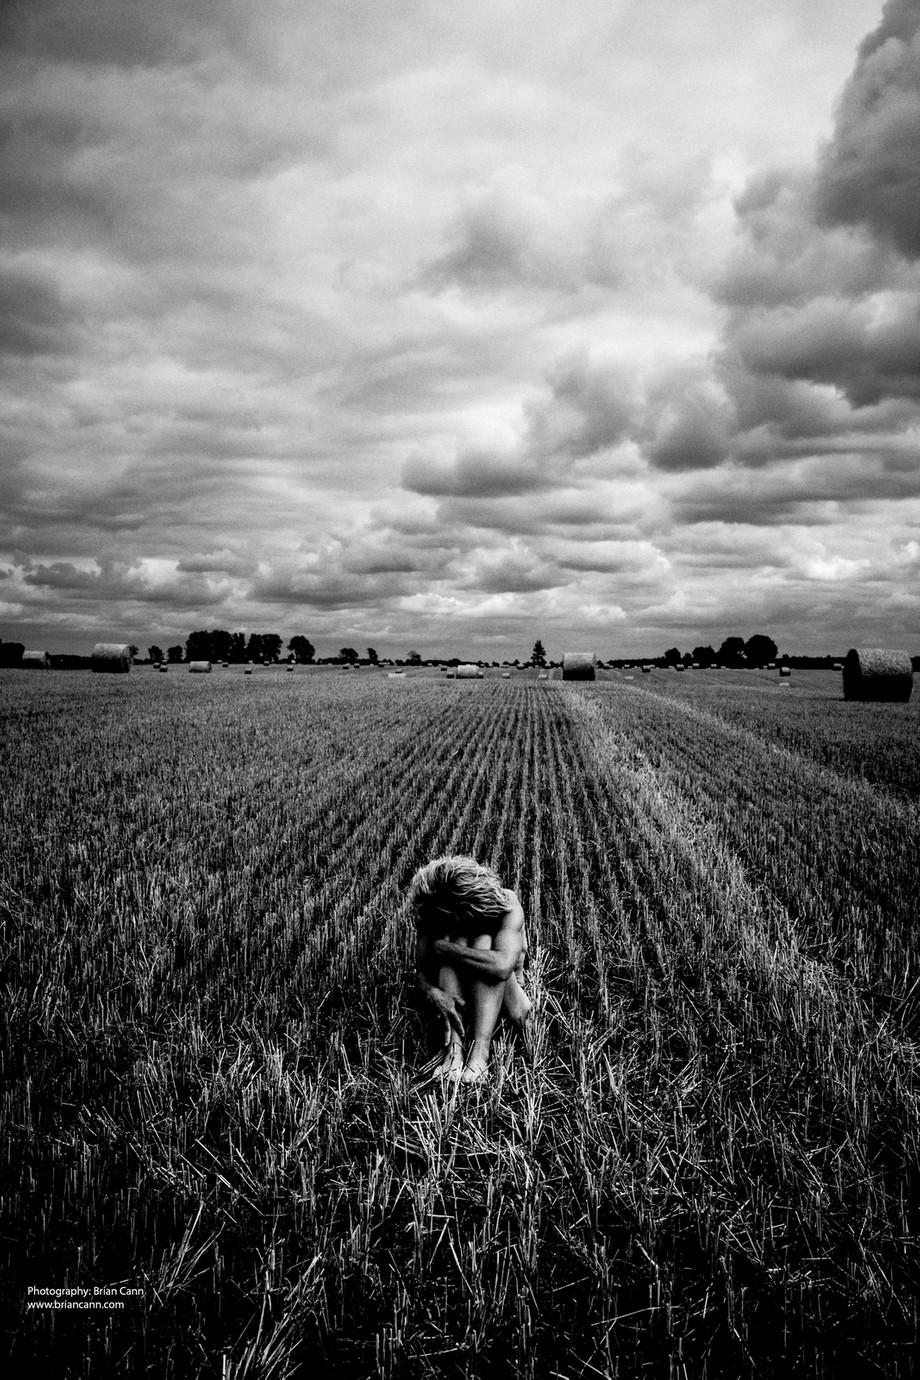 In a field in Mecklenburg-Vorpommern by briancann - Monthly Pro Photo Contest Vol 45